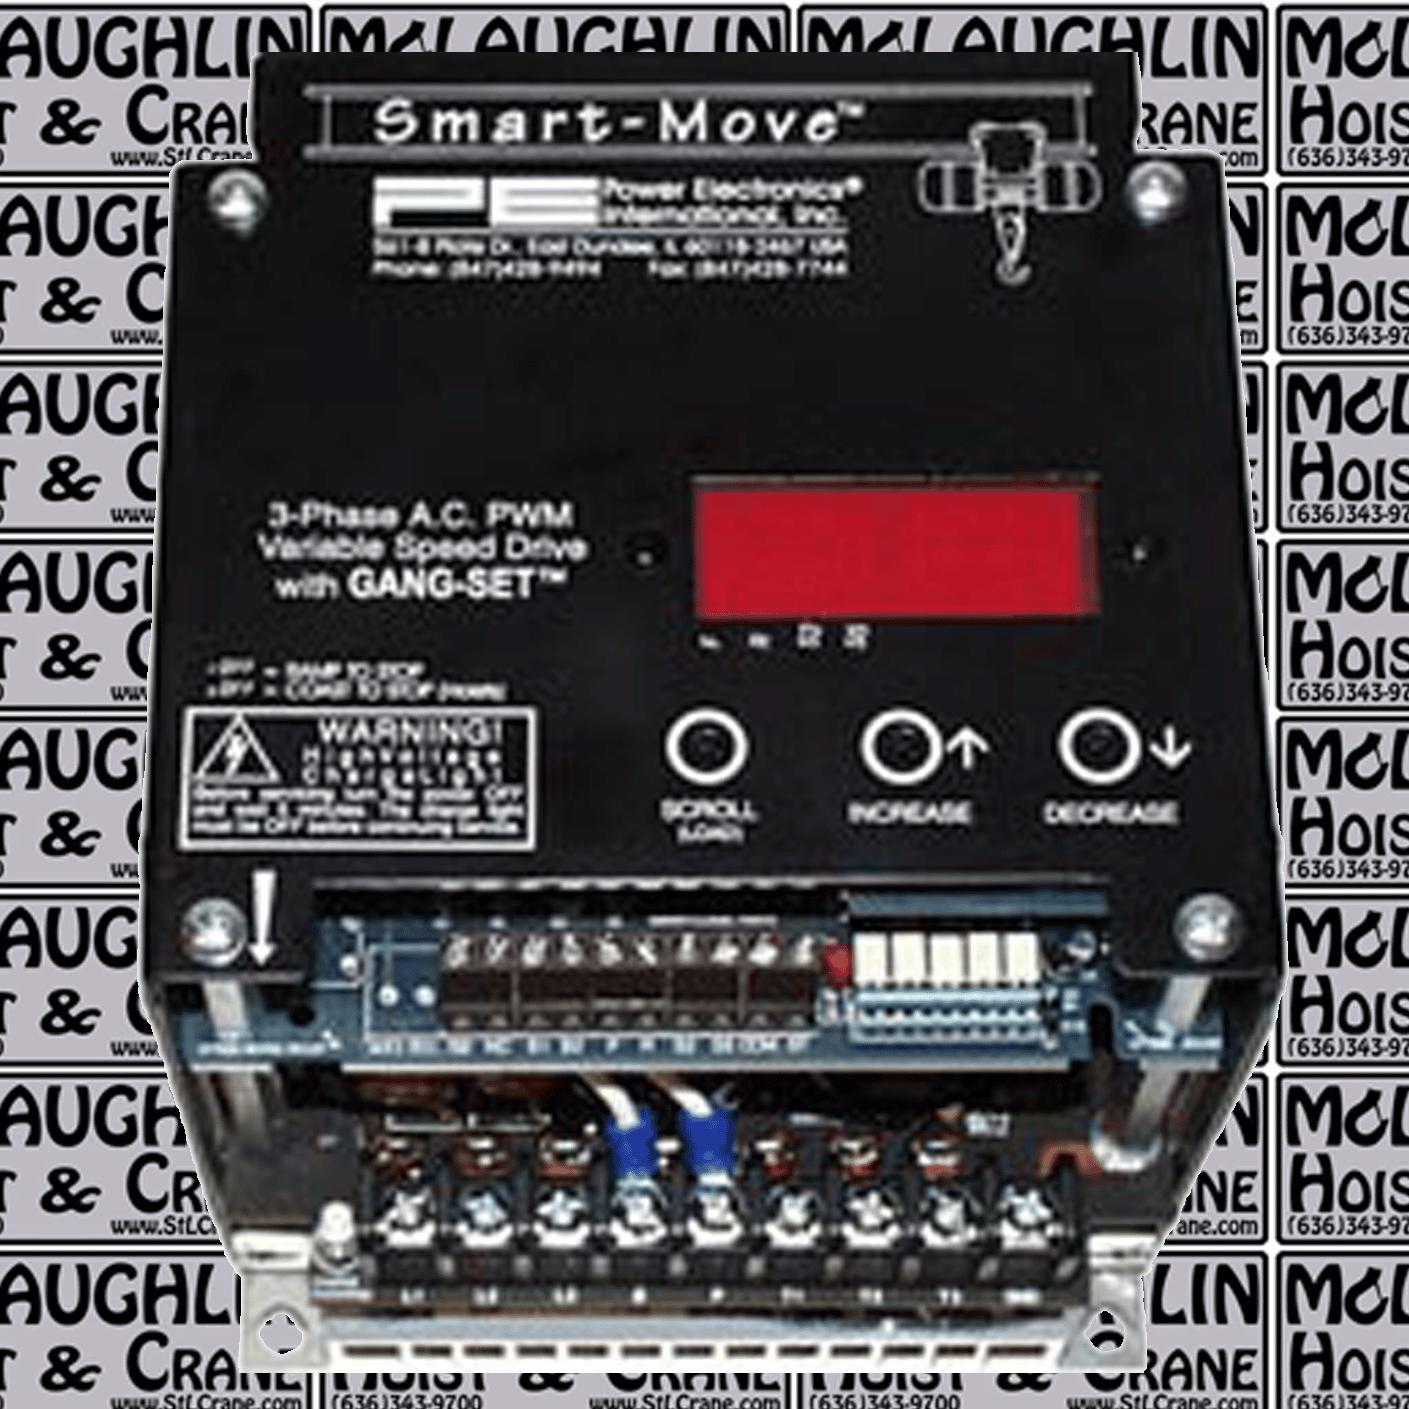 Power Electronics Micro-Speed Smart-Move